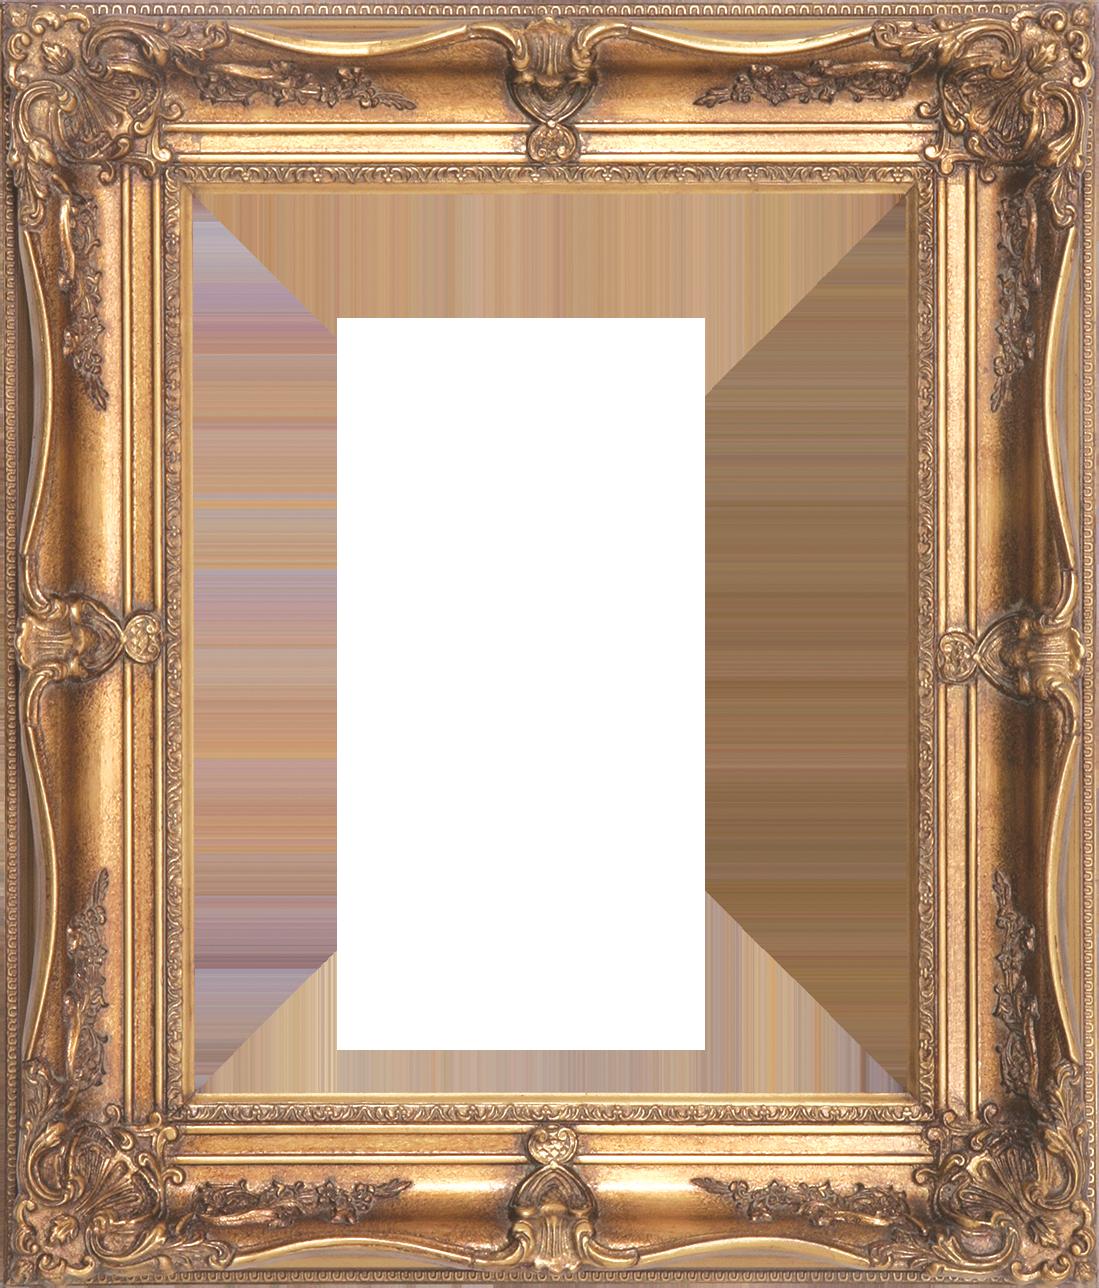 451 Zoom Png 1099 1288 Readymade Frame Www Kendallhartcraft Com